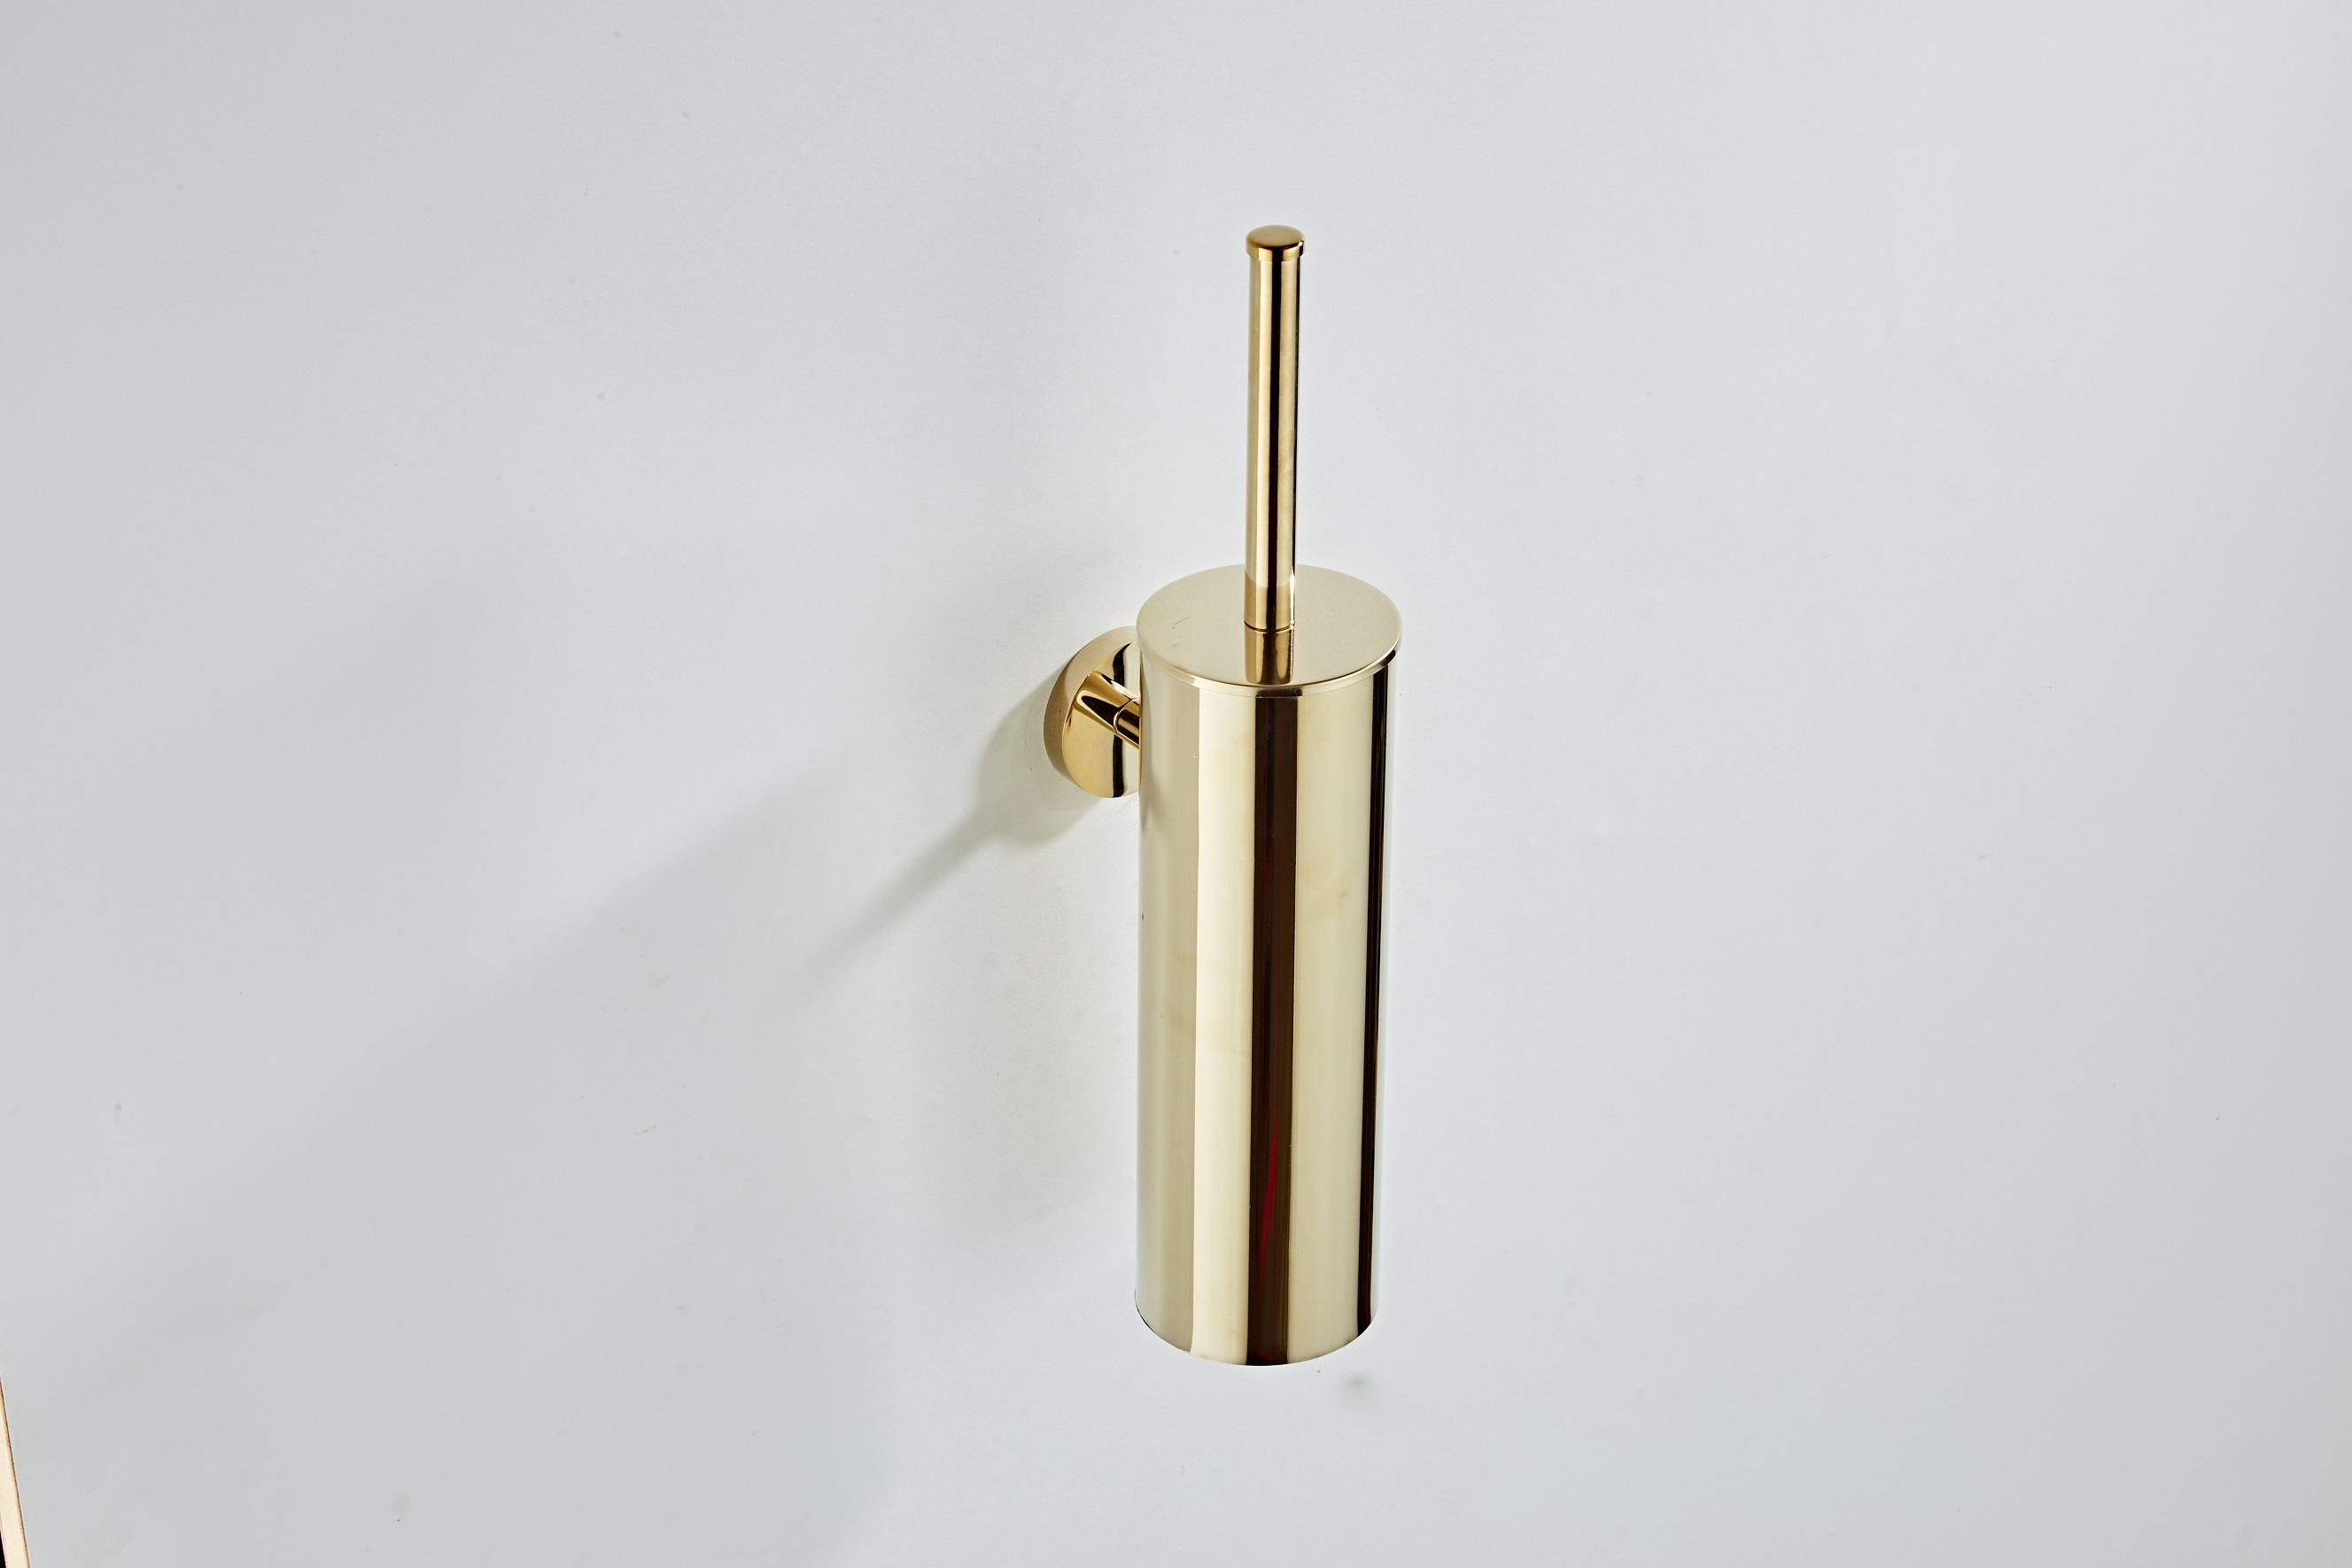 Saniclear Dorado toiletborstel met wandhouder goud